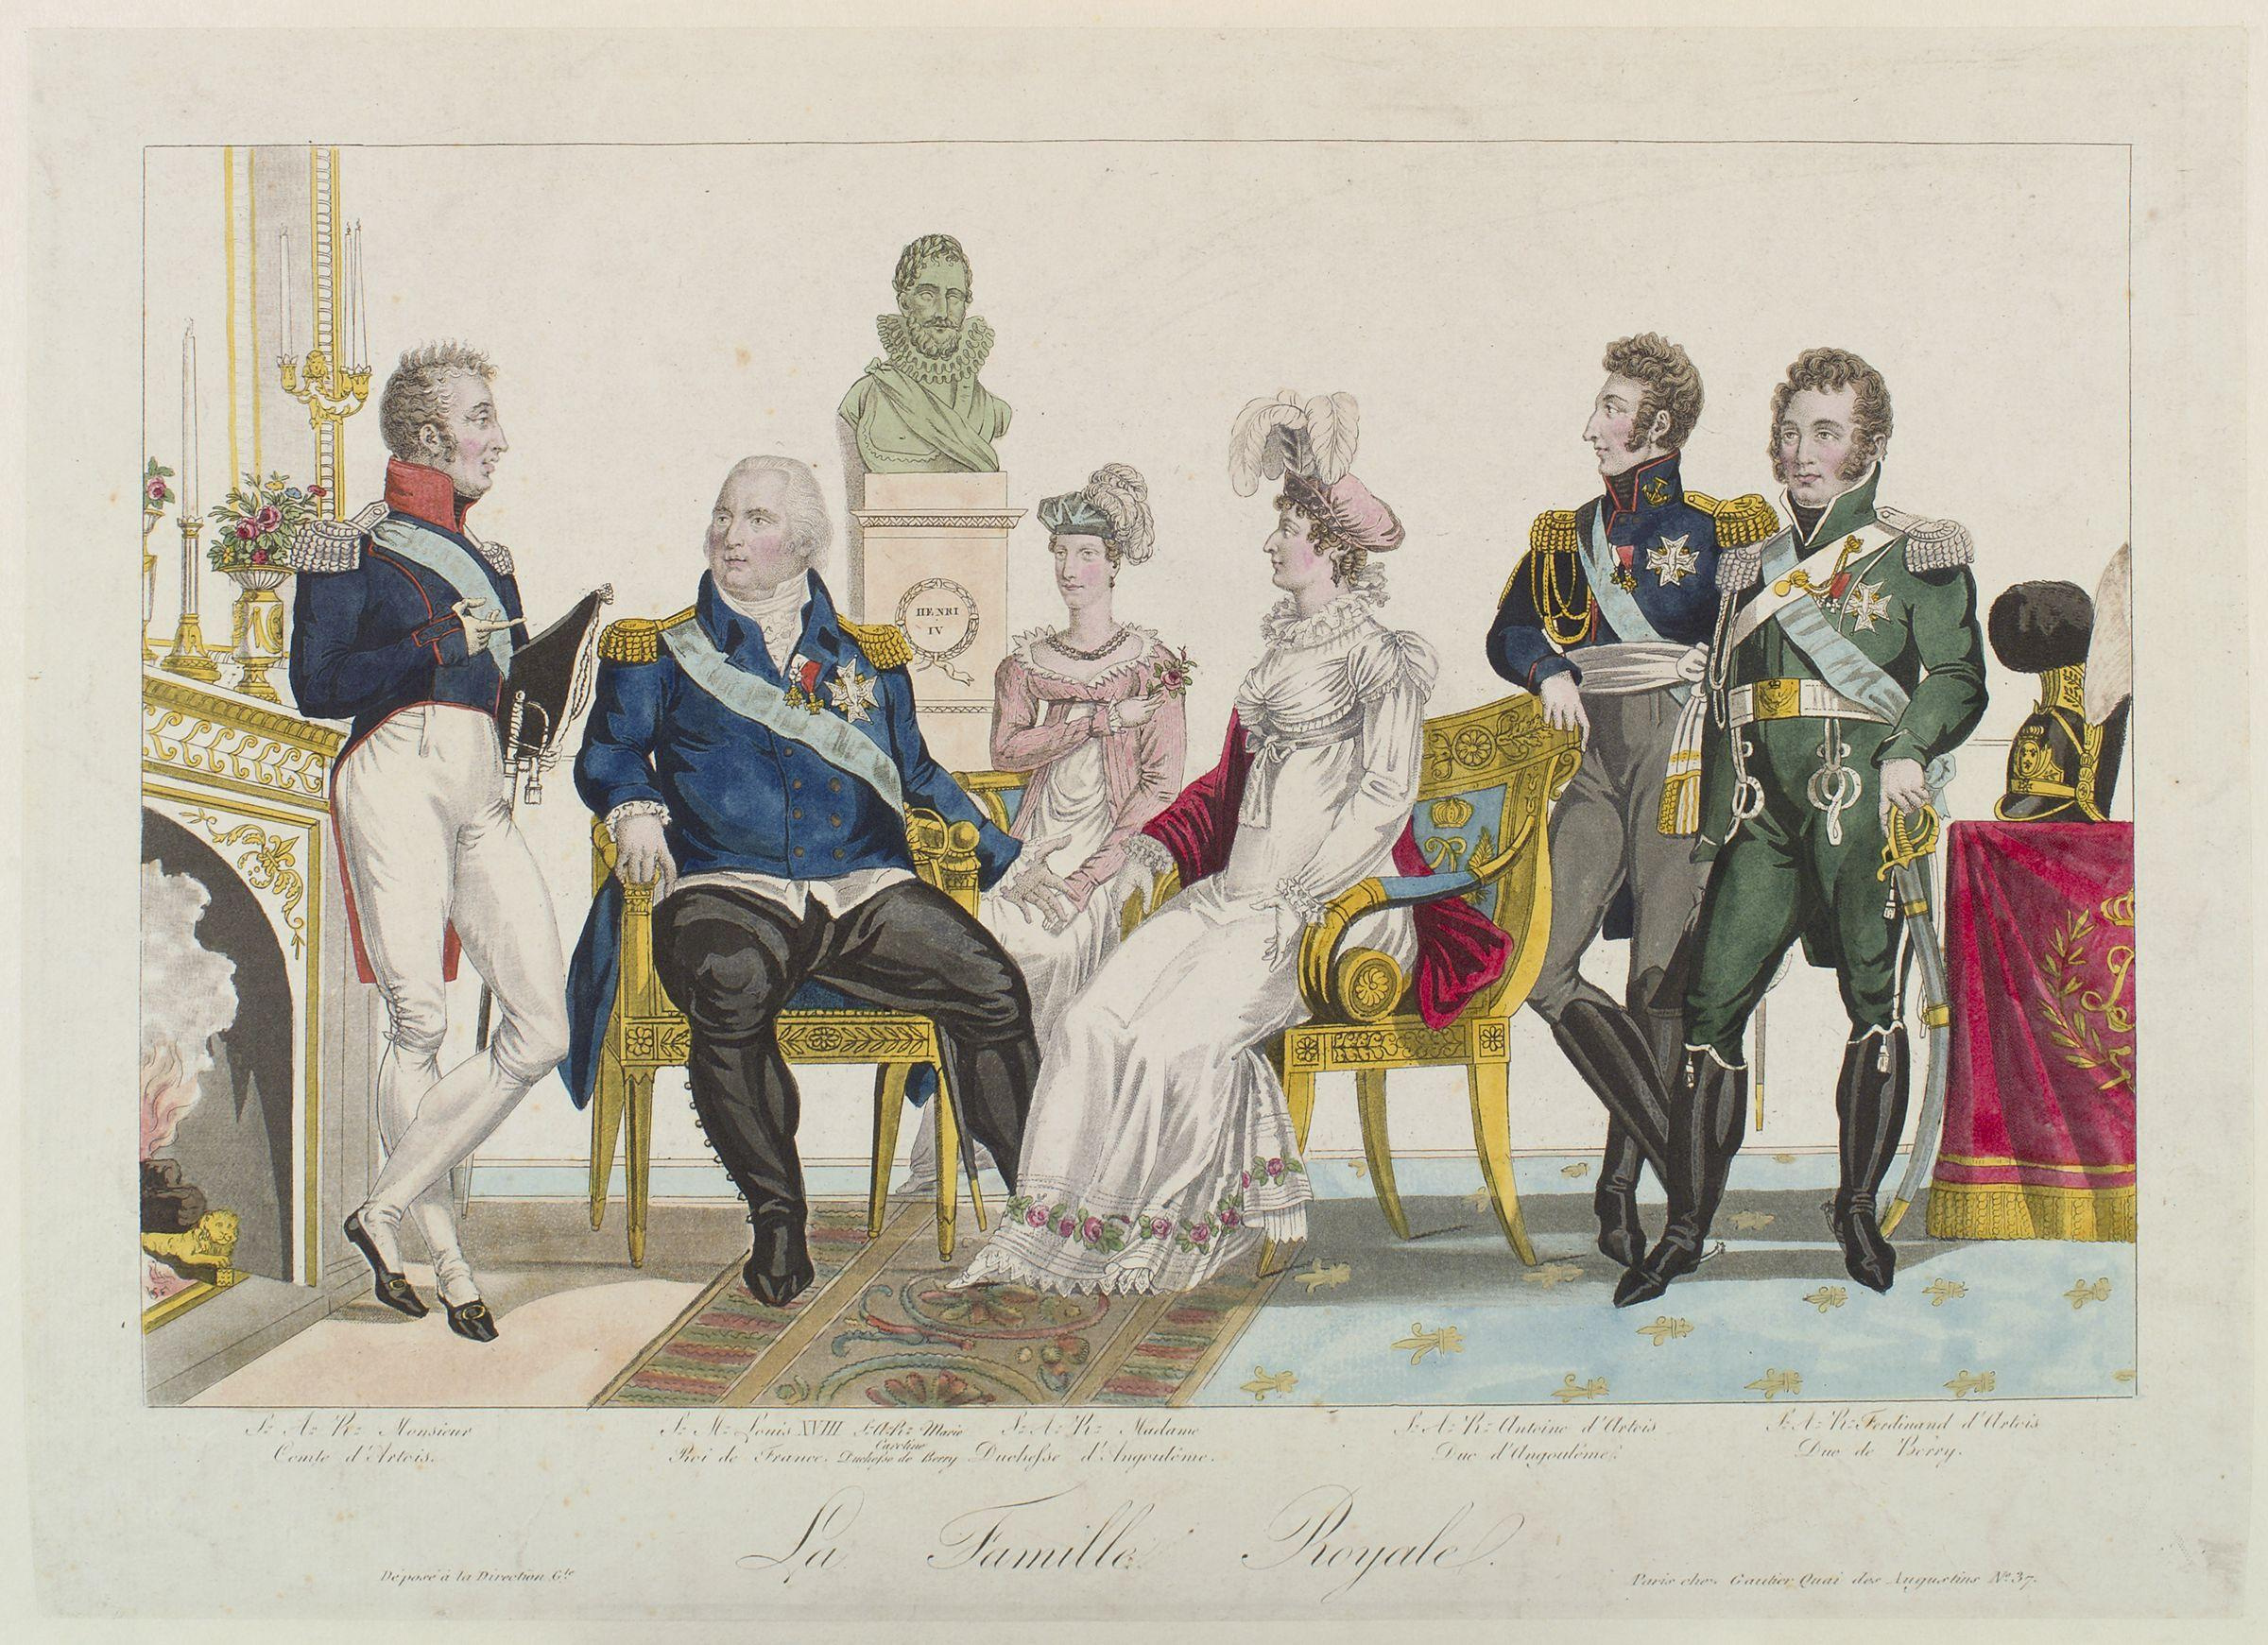 Louis XVIII of France | Military Wiki | FANDOM powered by ...